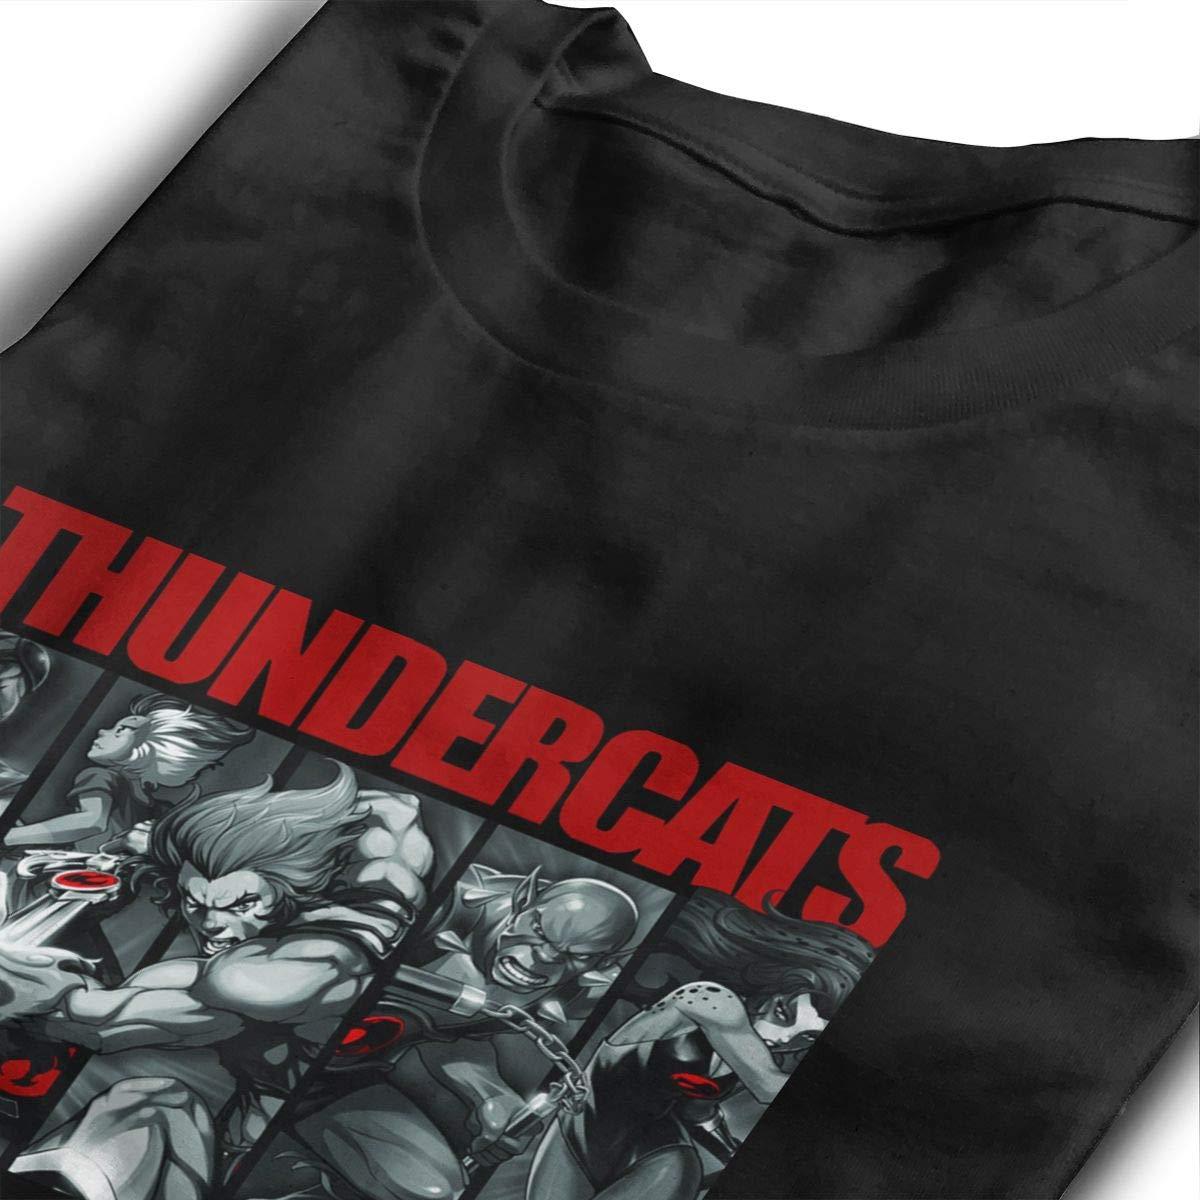 BilliePhillips Teens Thundercats Leisure Long Sleeve Tee Shirt